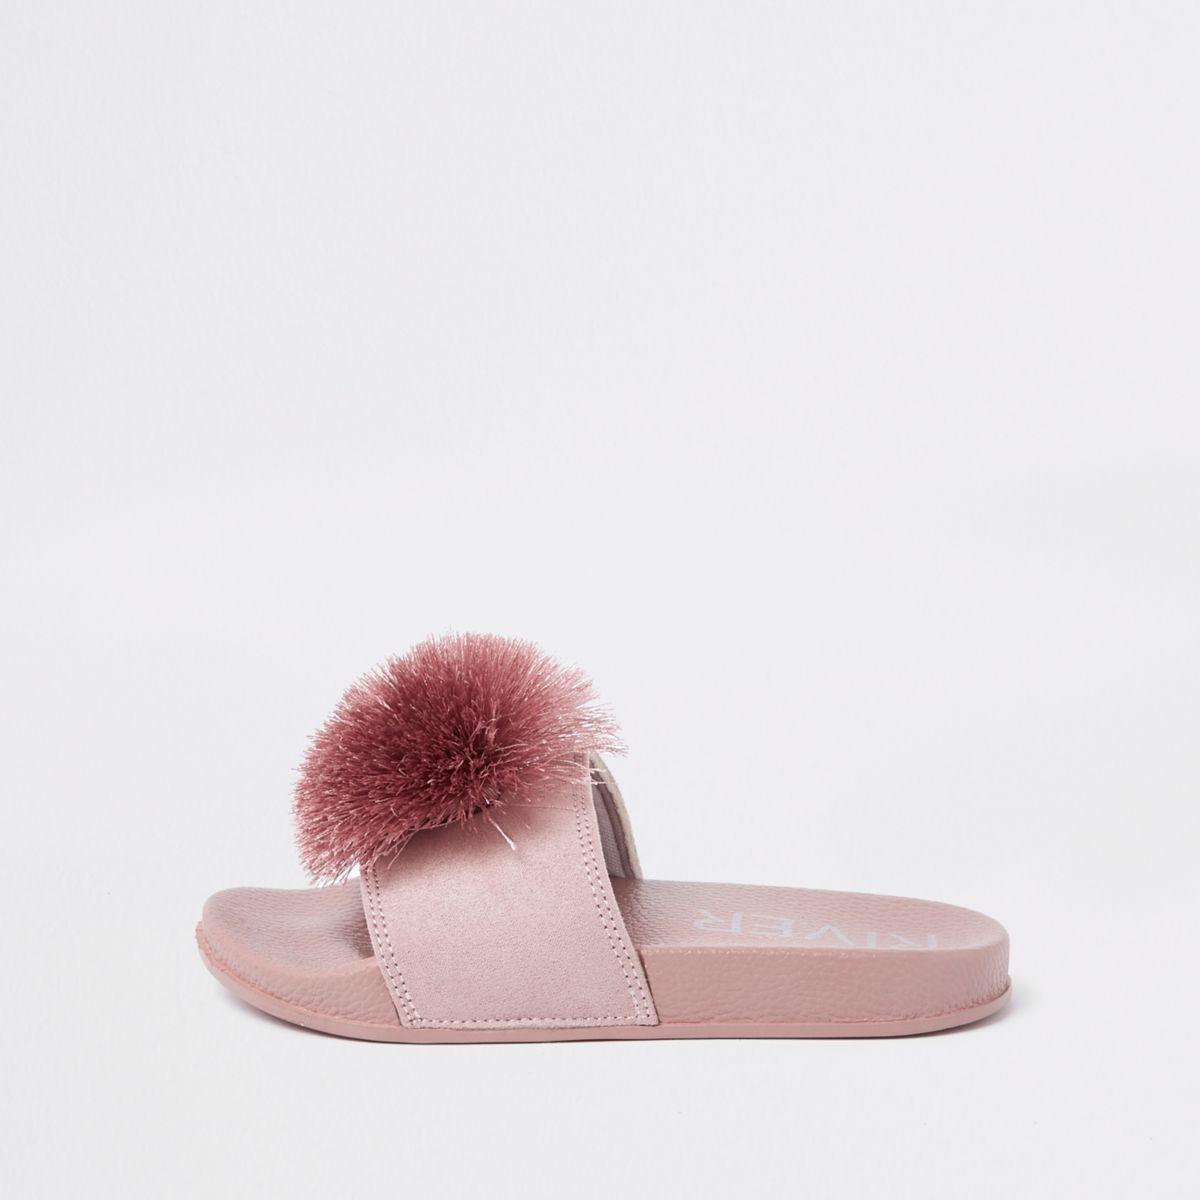 Girls pink pom pom sliders